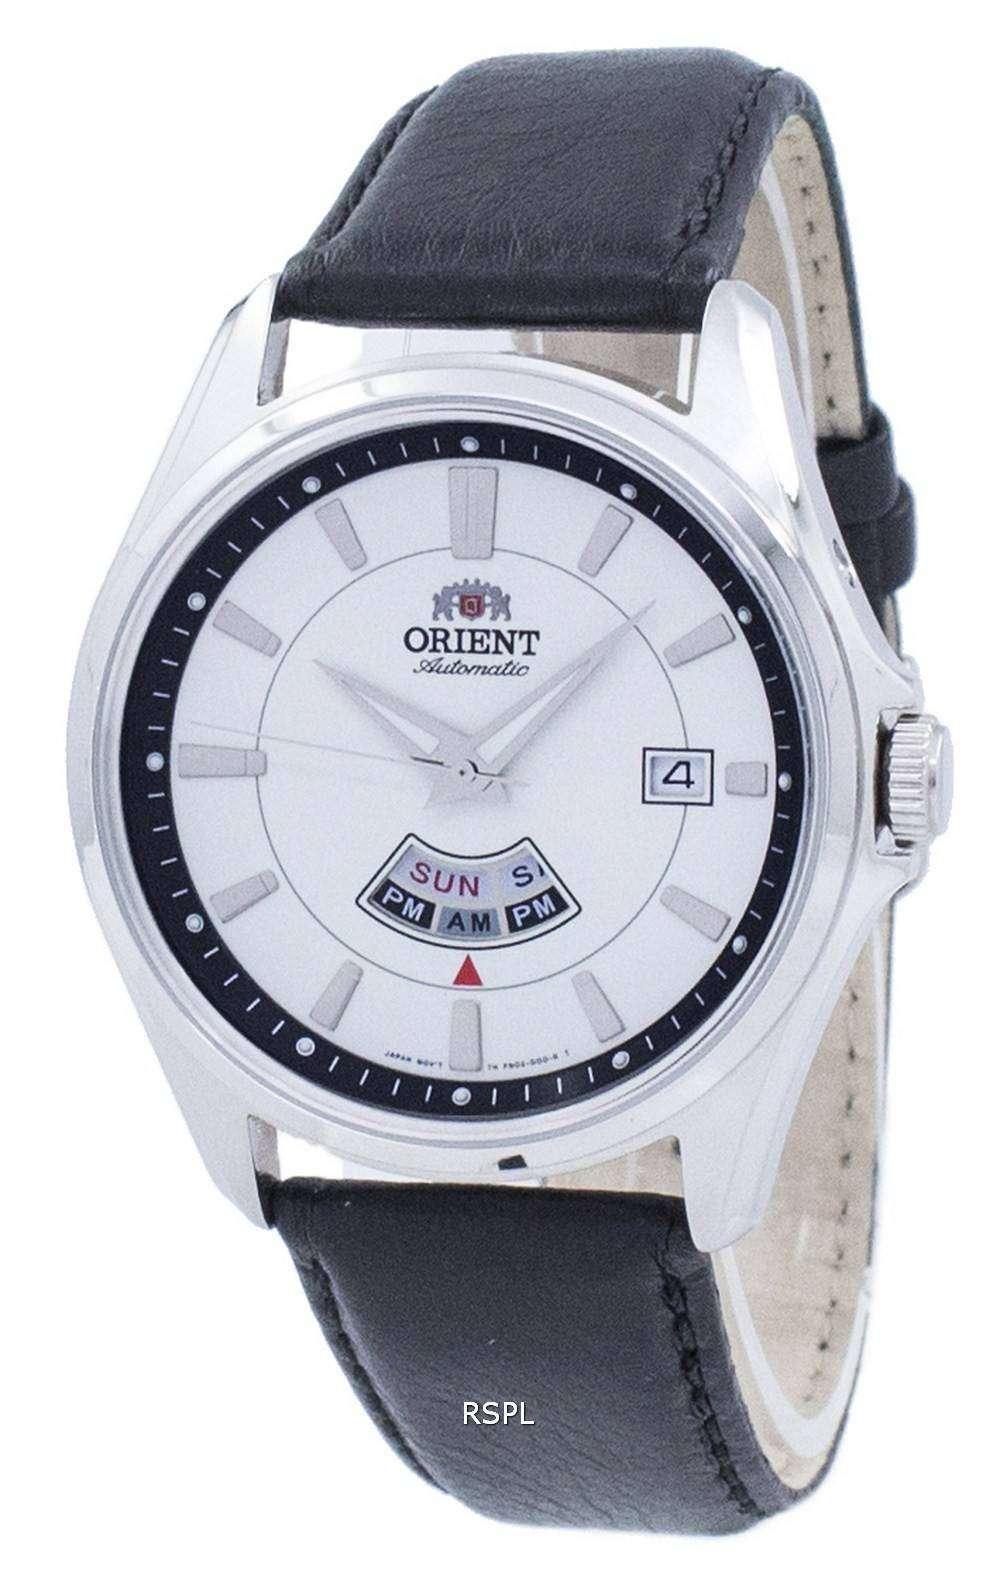 511f39e3959e Oriente clásico 21 joyas automática esfera blanca FN02005W reloj de hombres